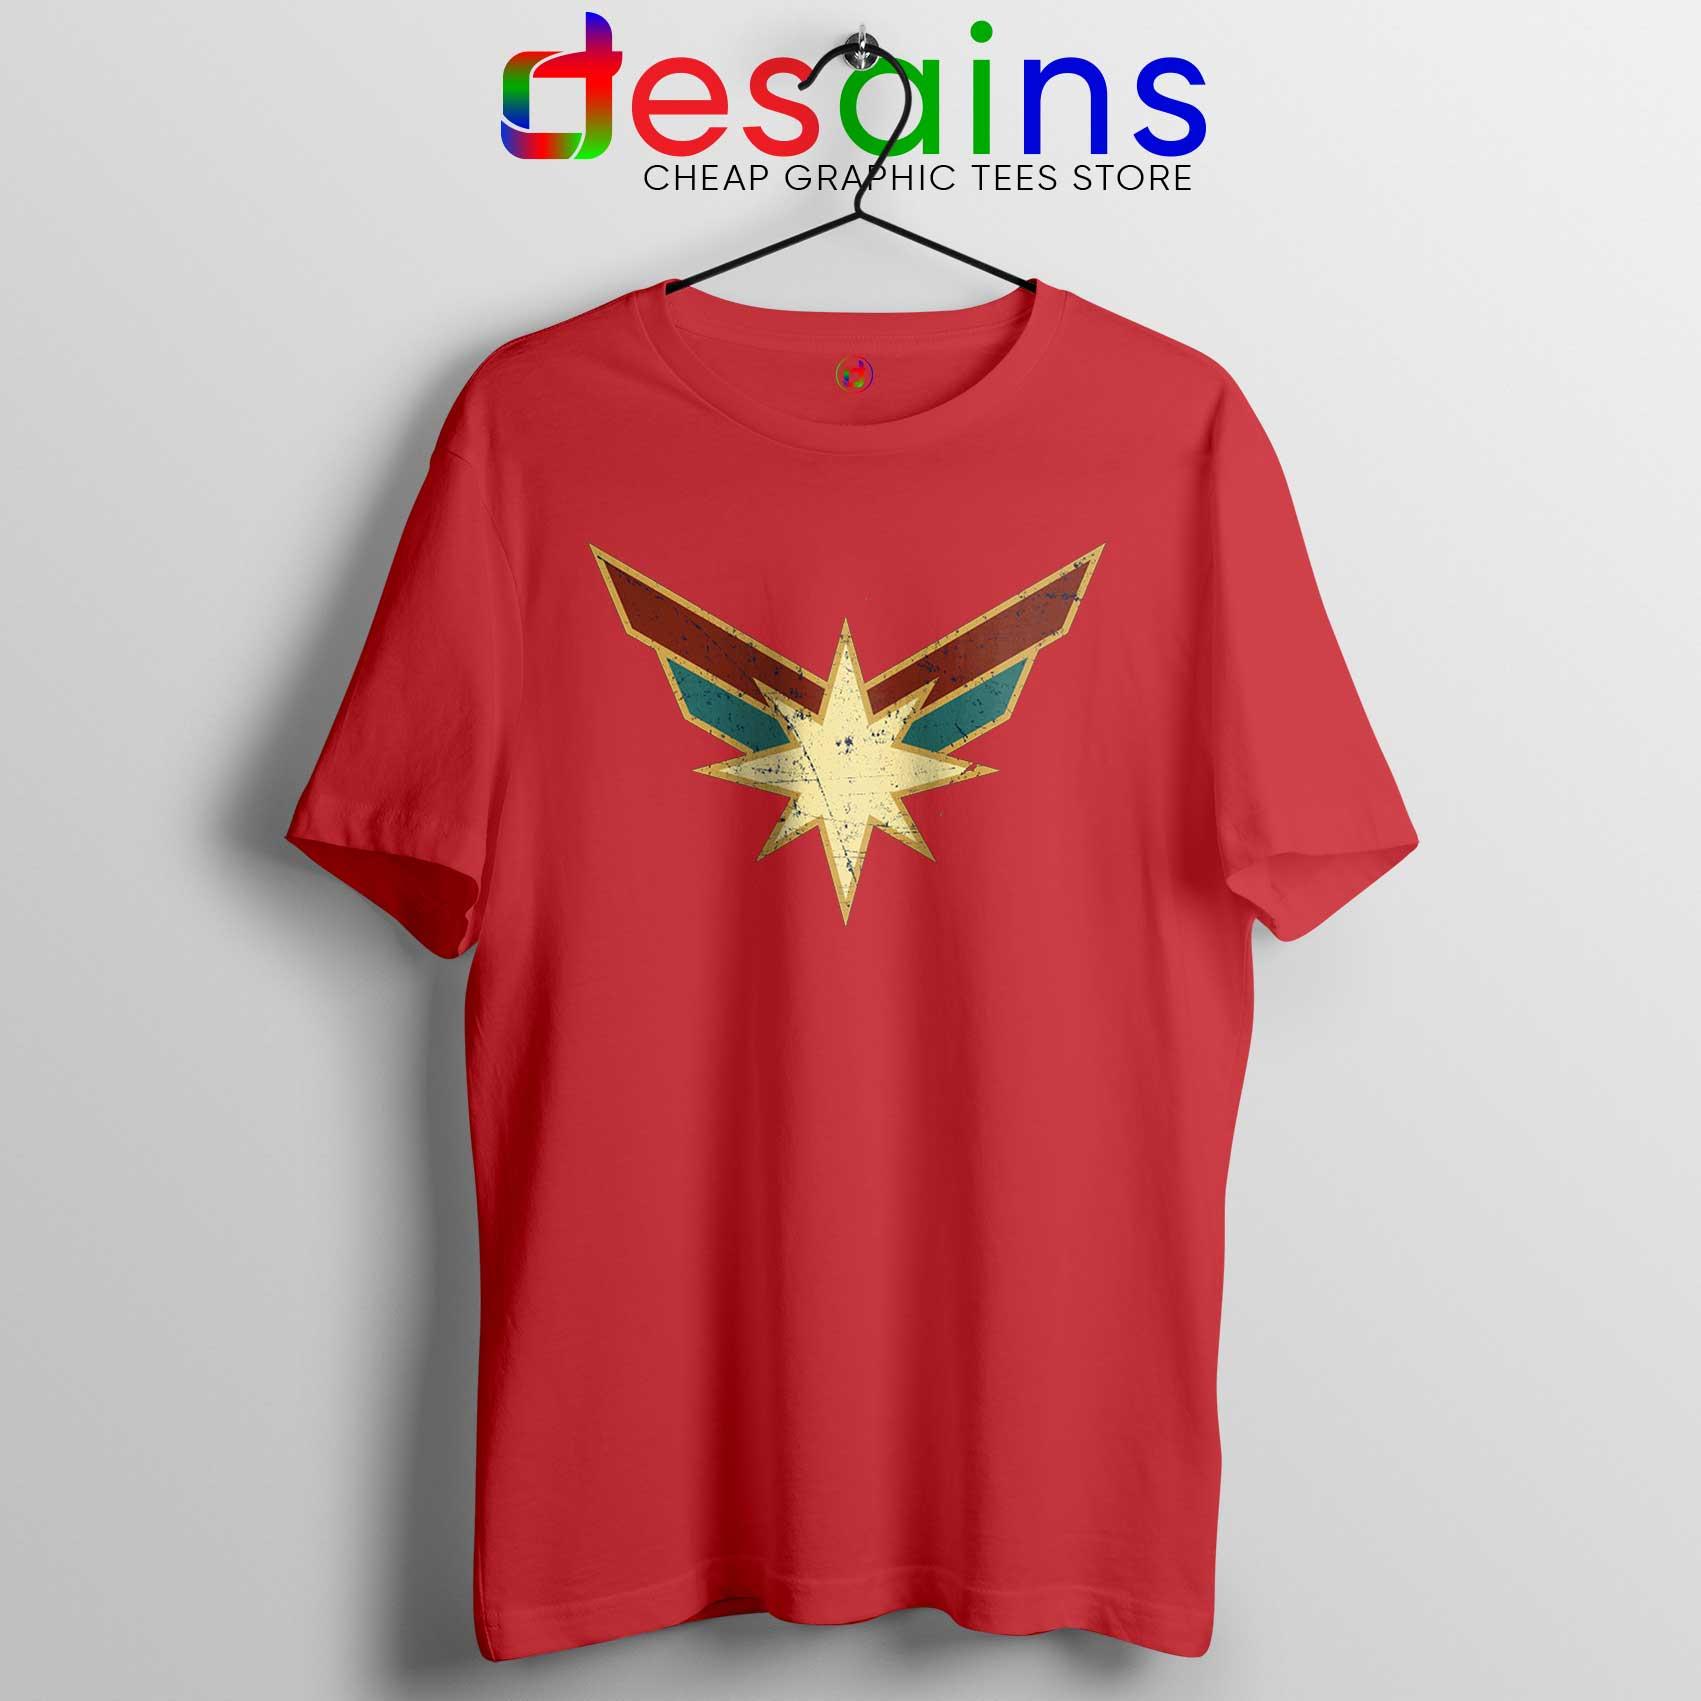 9d1abc96e Best-Tee-Shirt-Captain-Marvel-Seal-Costume-T-shirt-Size-S-3XL.jpg